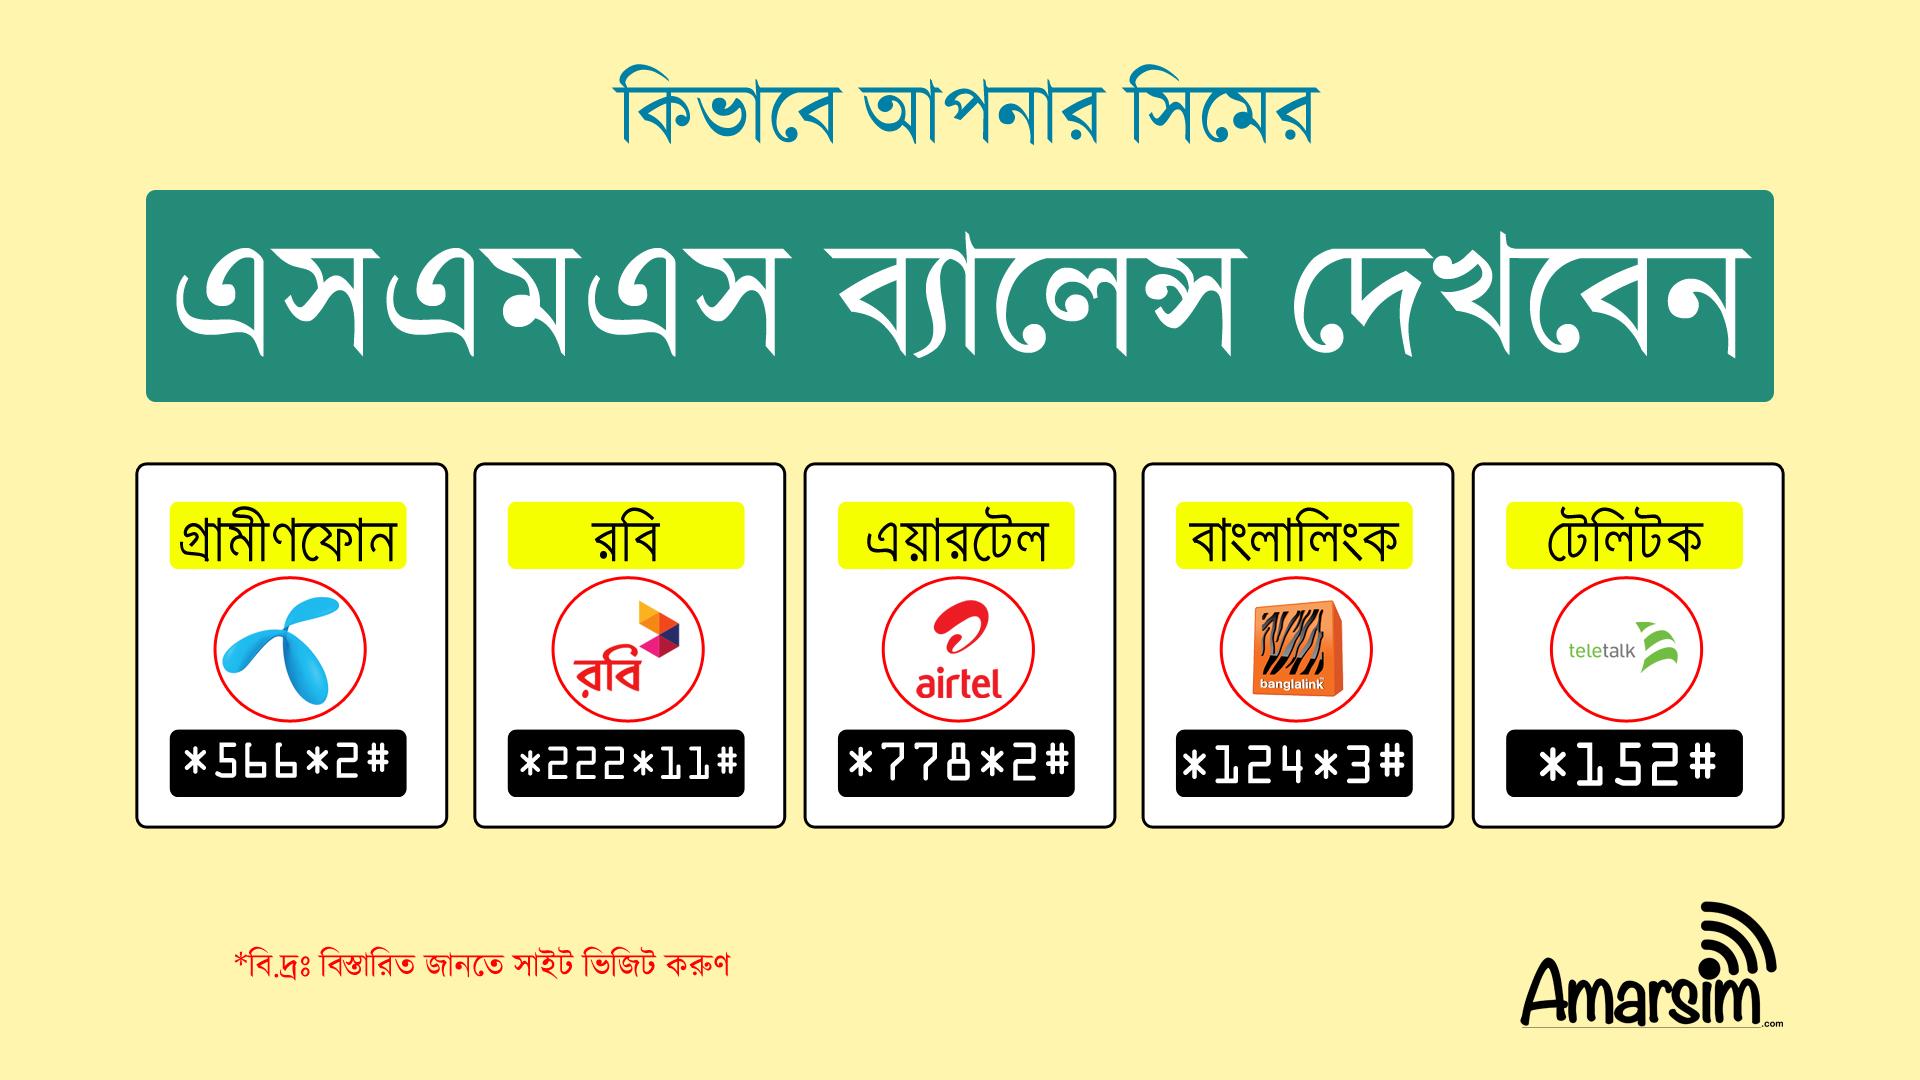 How To Check SMS In GP, Robi, Airtel, Banglalink, Teletalk